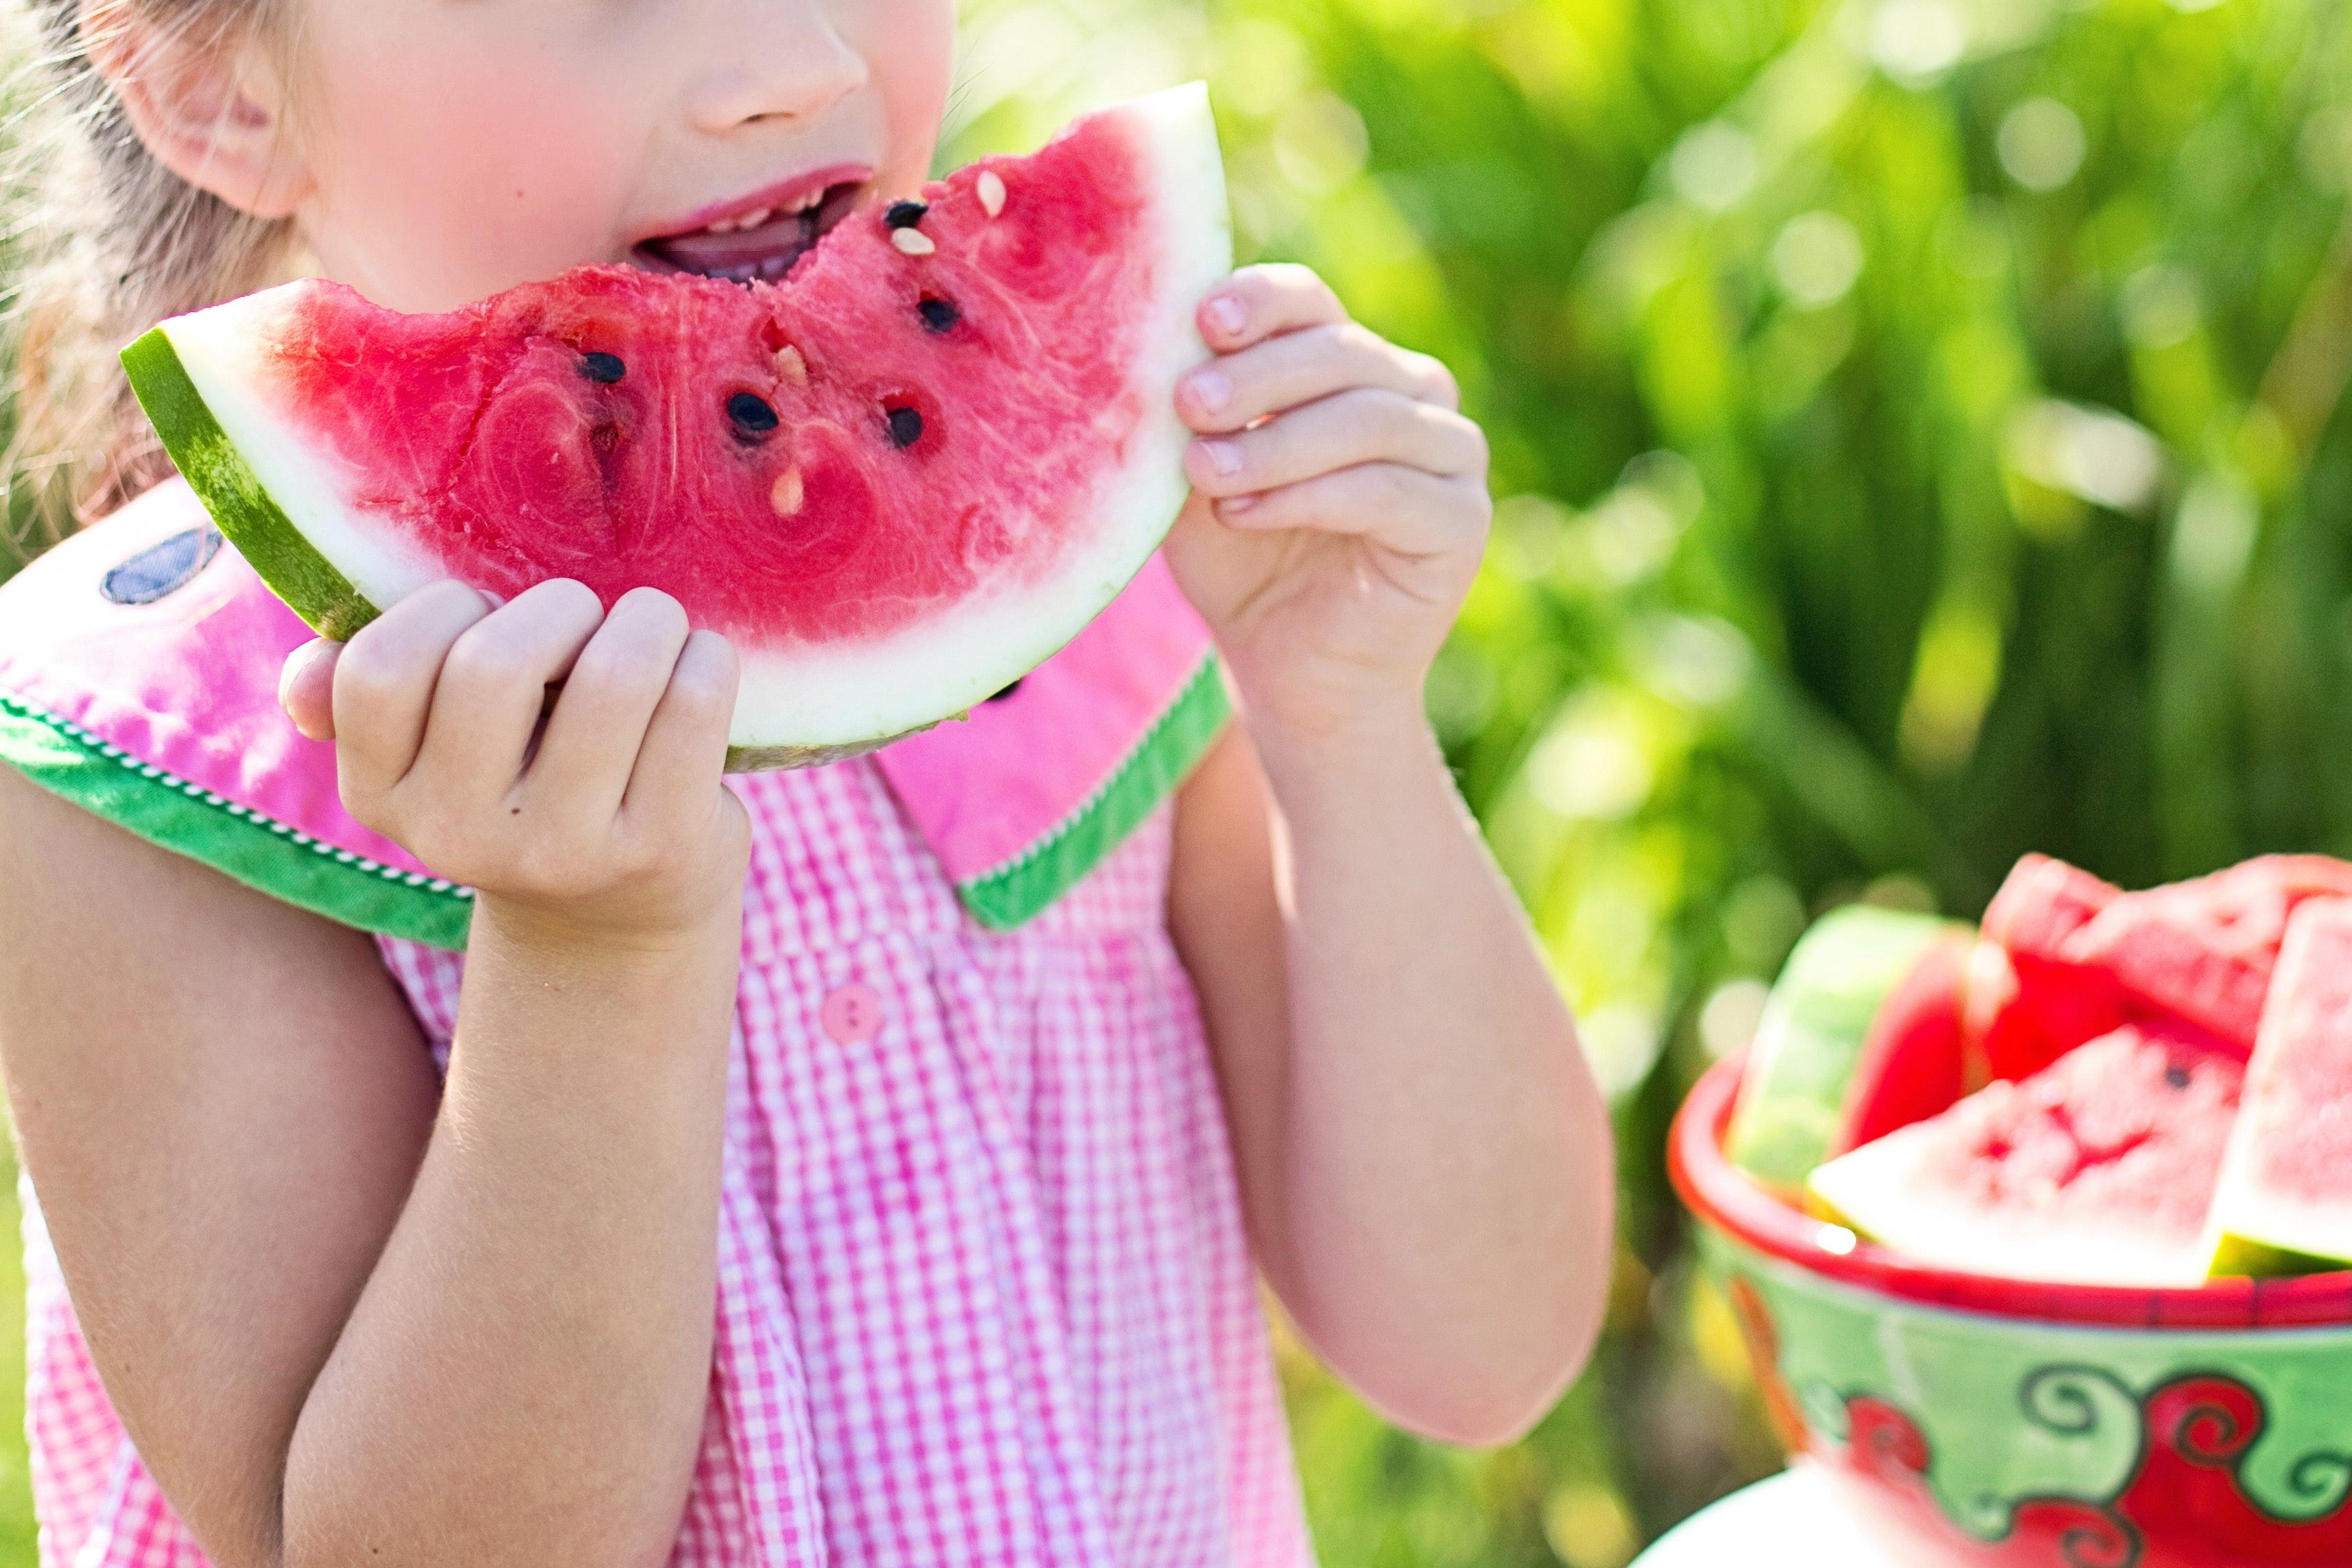 child-eating-food-35545